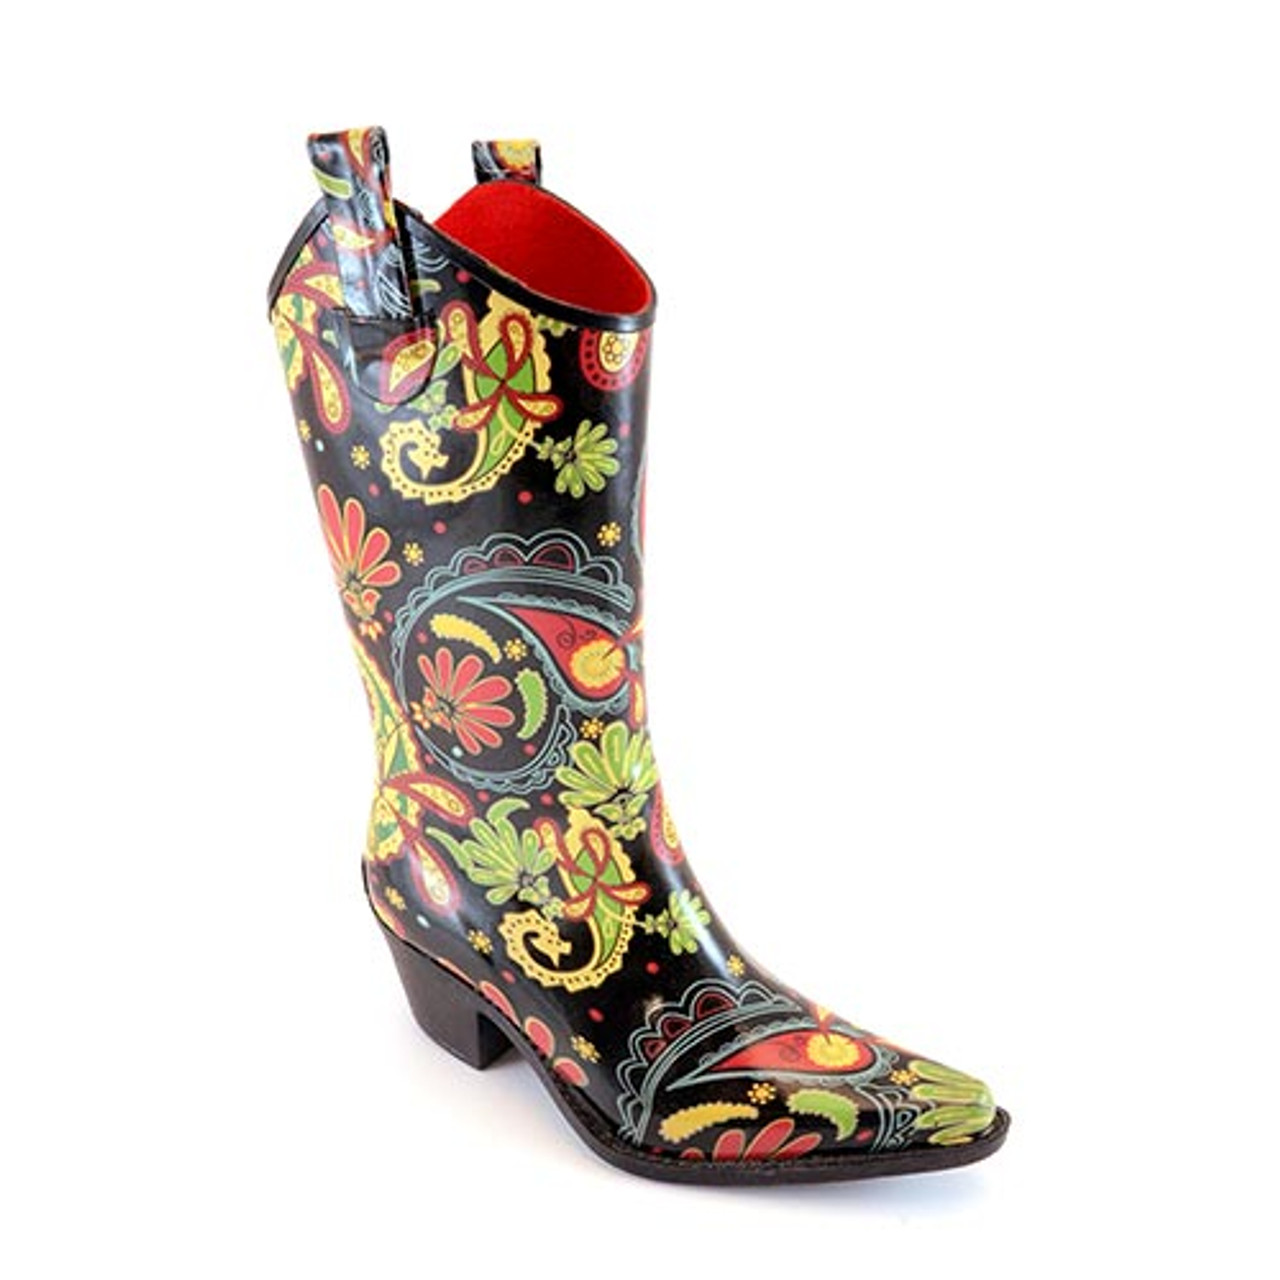 7ad0d9e68cd Corky's Women's Footwear - Rodeo - Paisley - Rain Boot